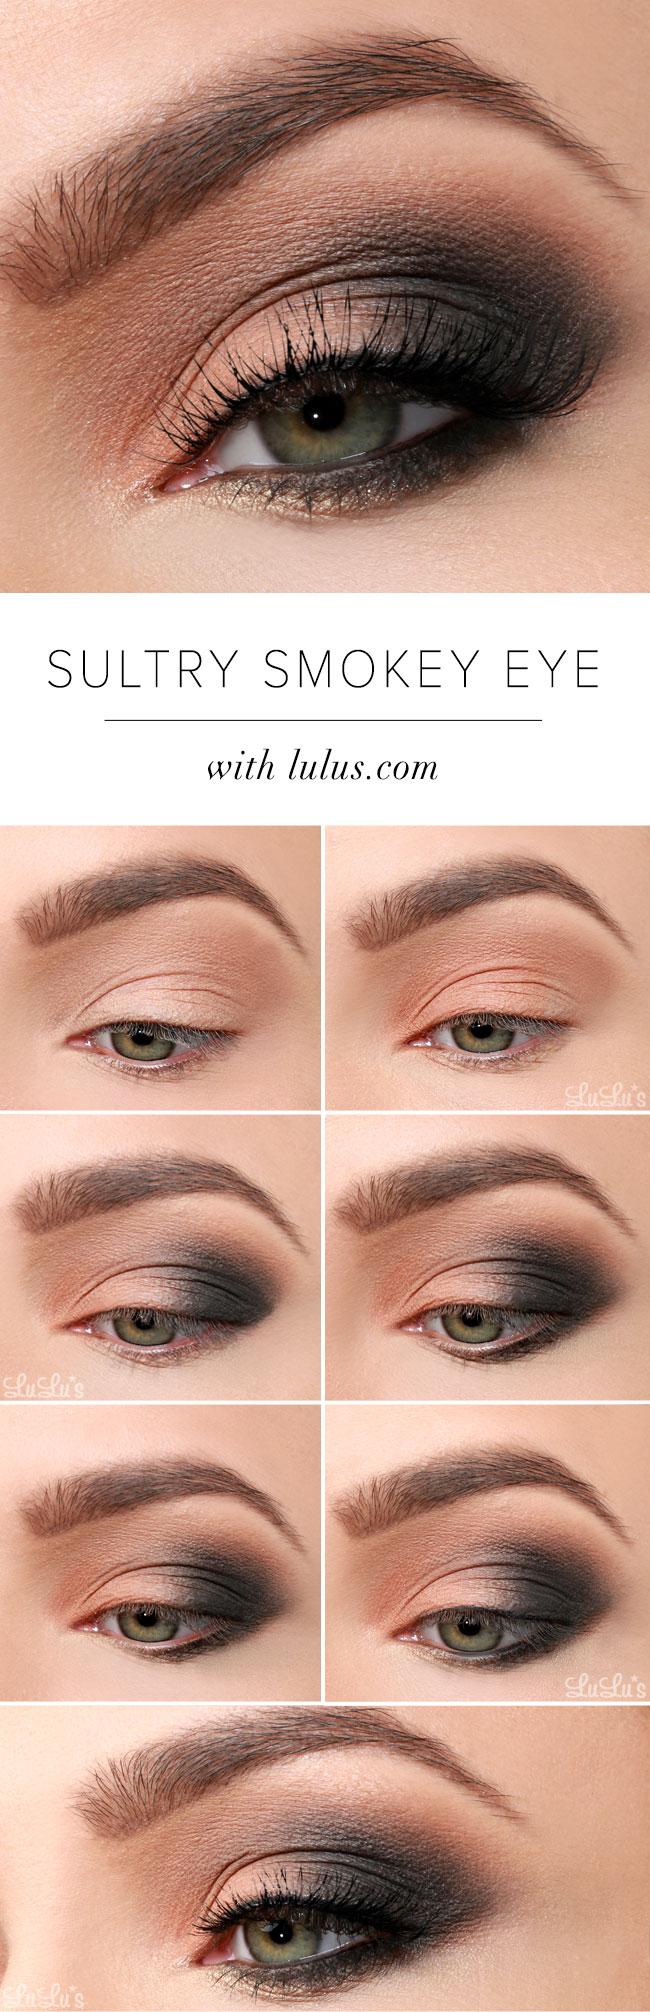 lulus how-to: sultry smokey eye makeup tutorial - lulus